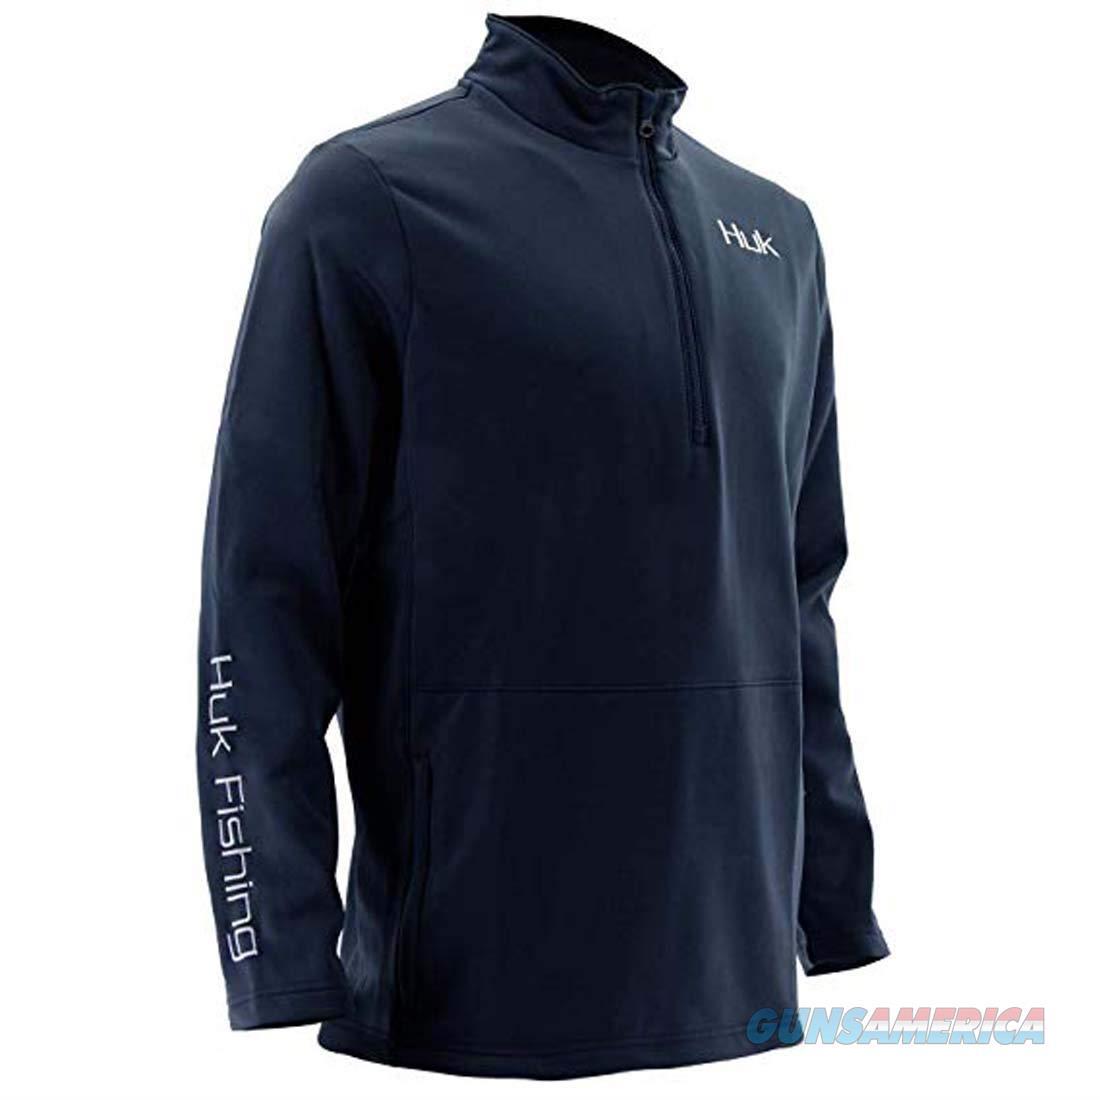 Huk Tidewater 1/4 Zip XL Navy  Non-Guns > Hunting Clothing and Equipment > Clothing > Shirts